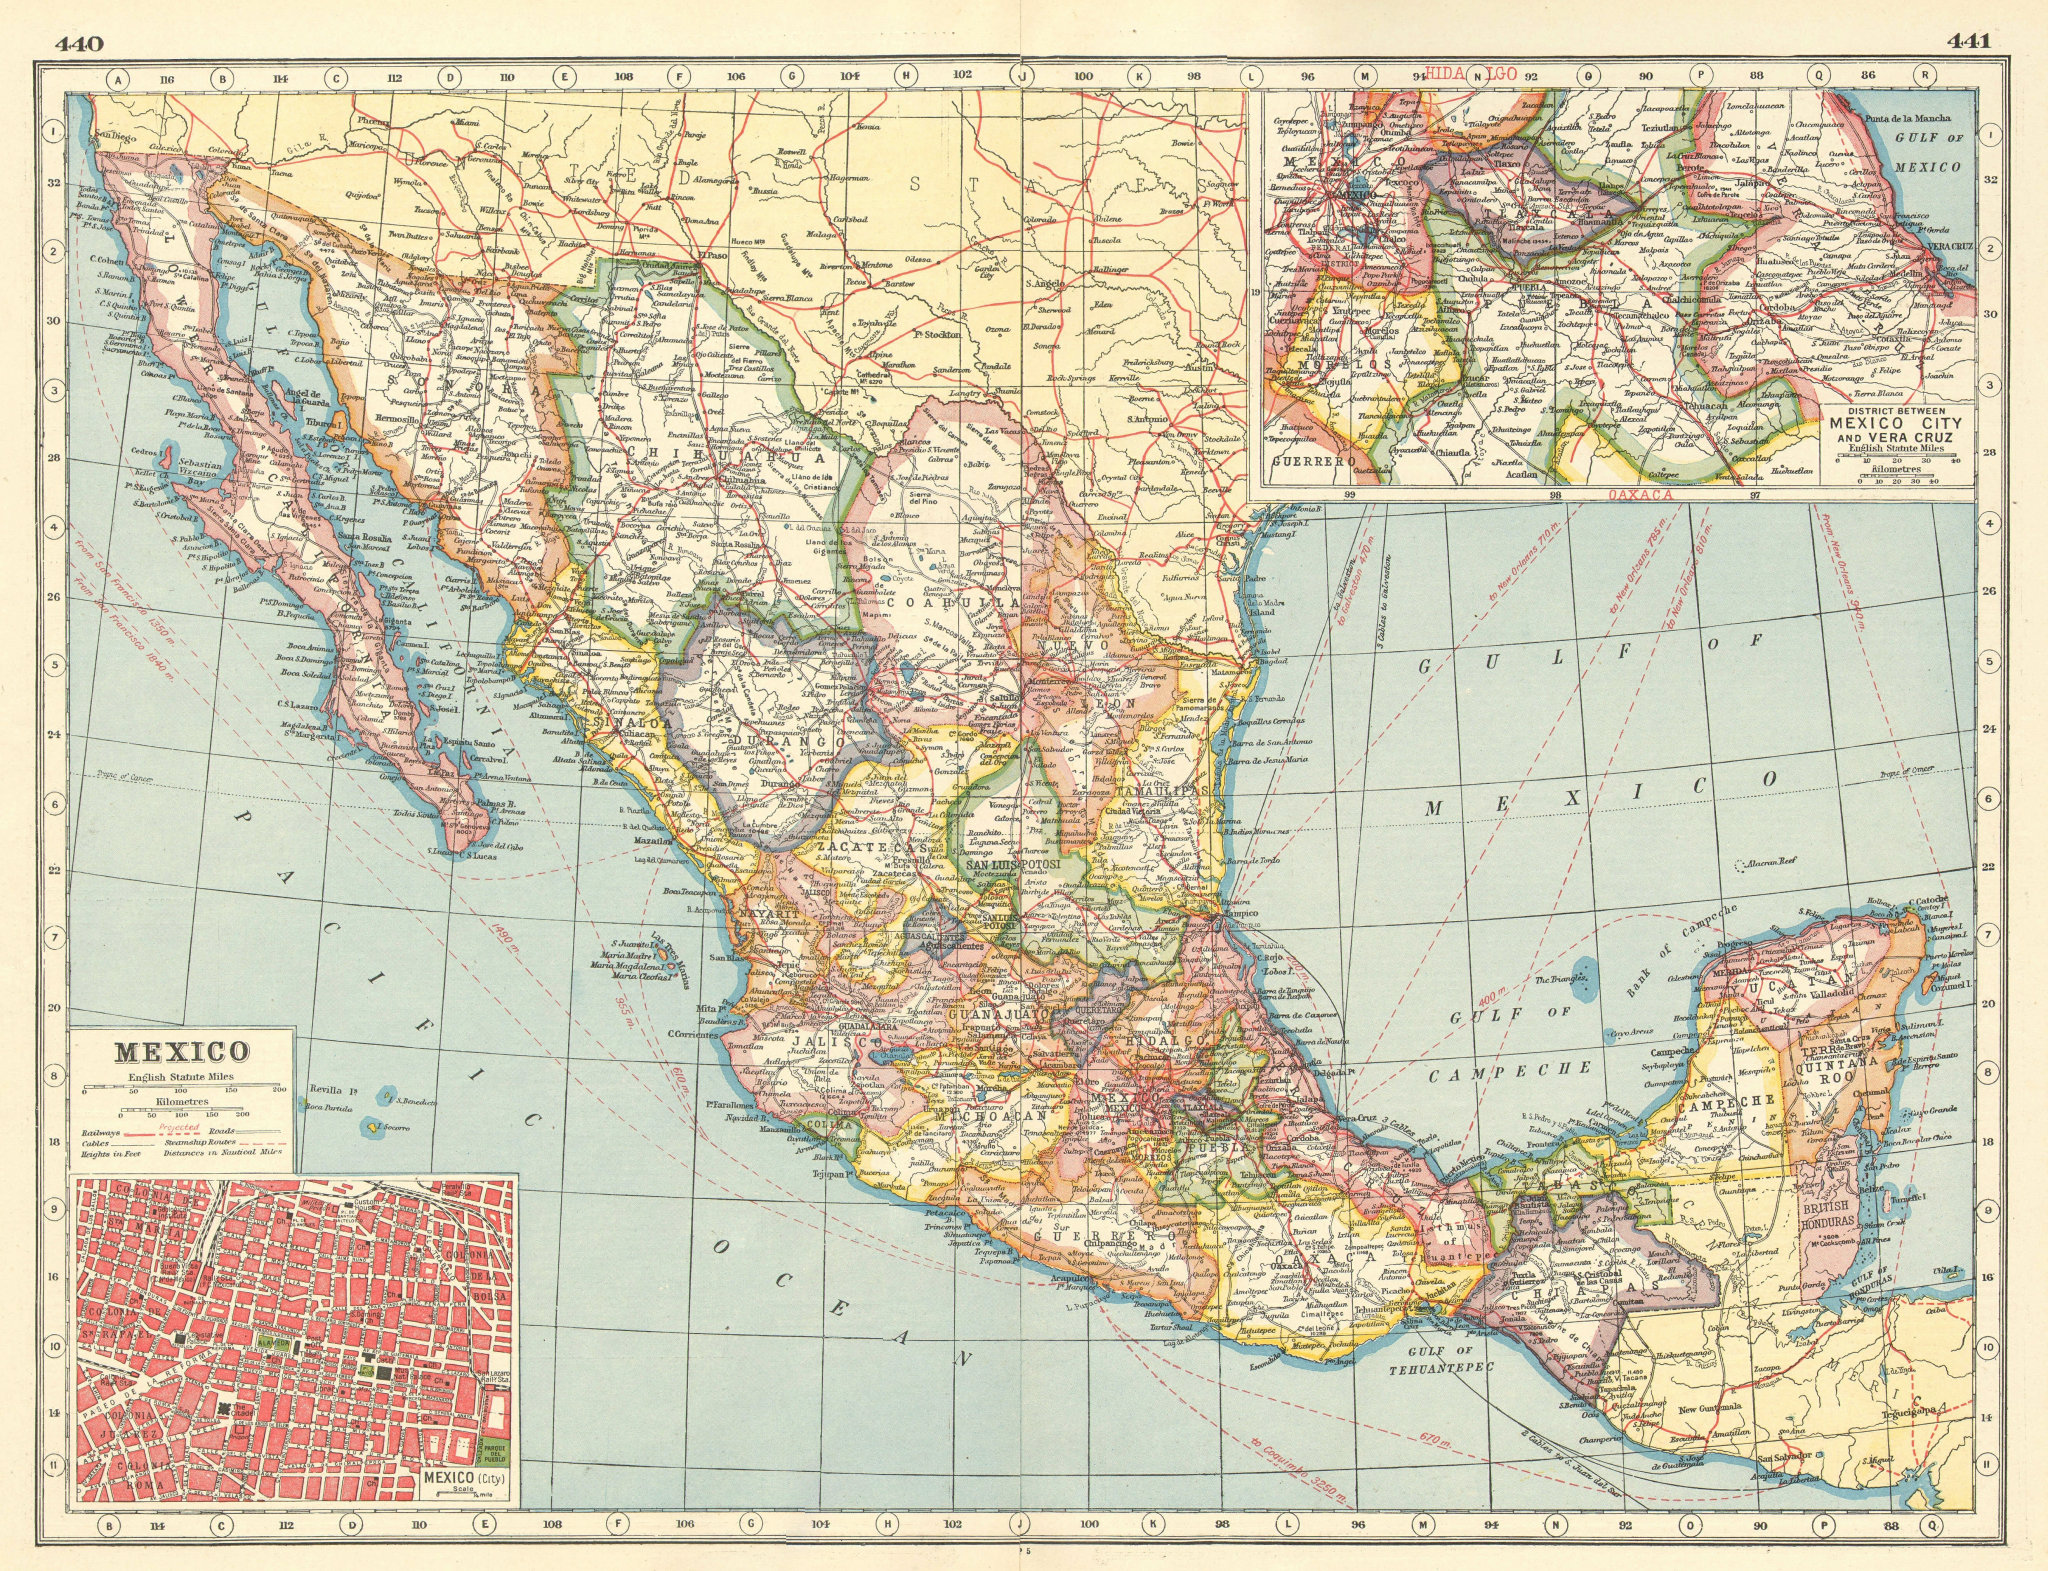 Associate Product MEXICO. Inset Mexico City plan; Mexico City-Veracruz district 1920 old map